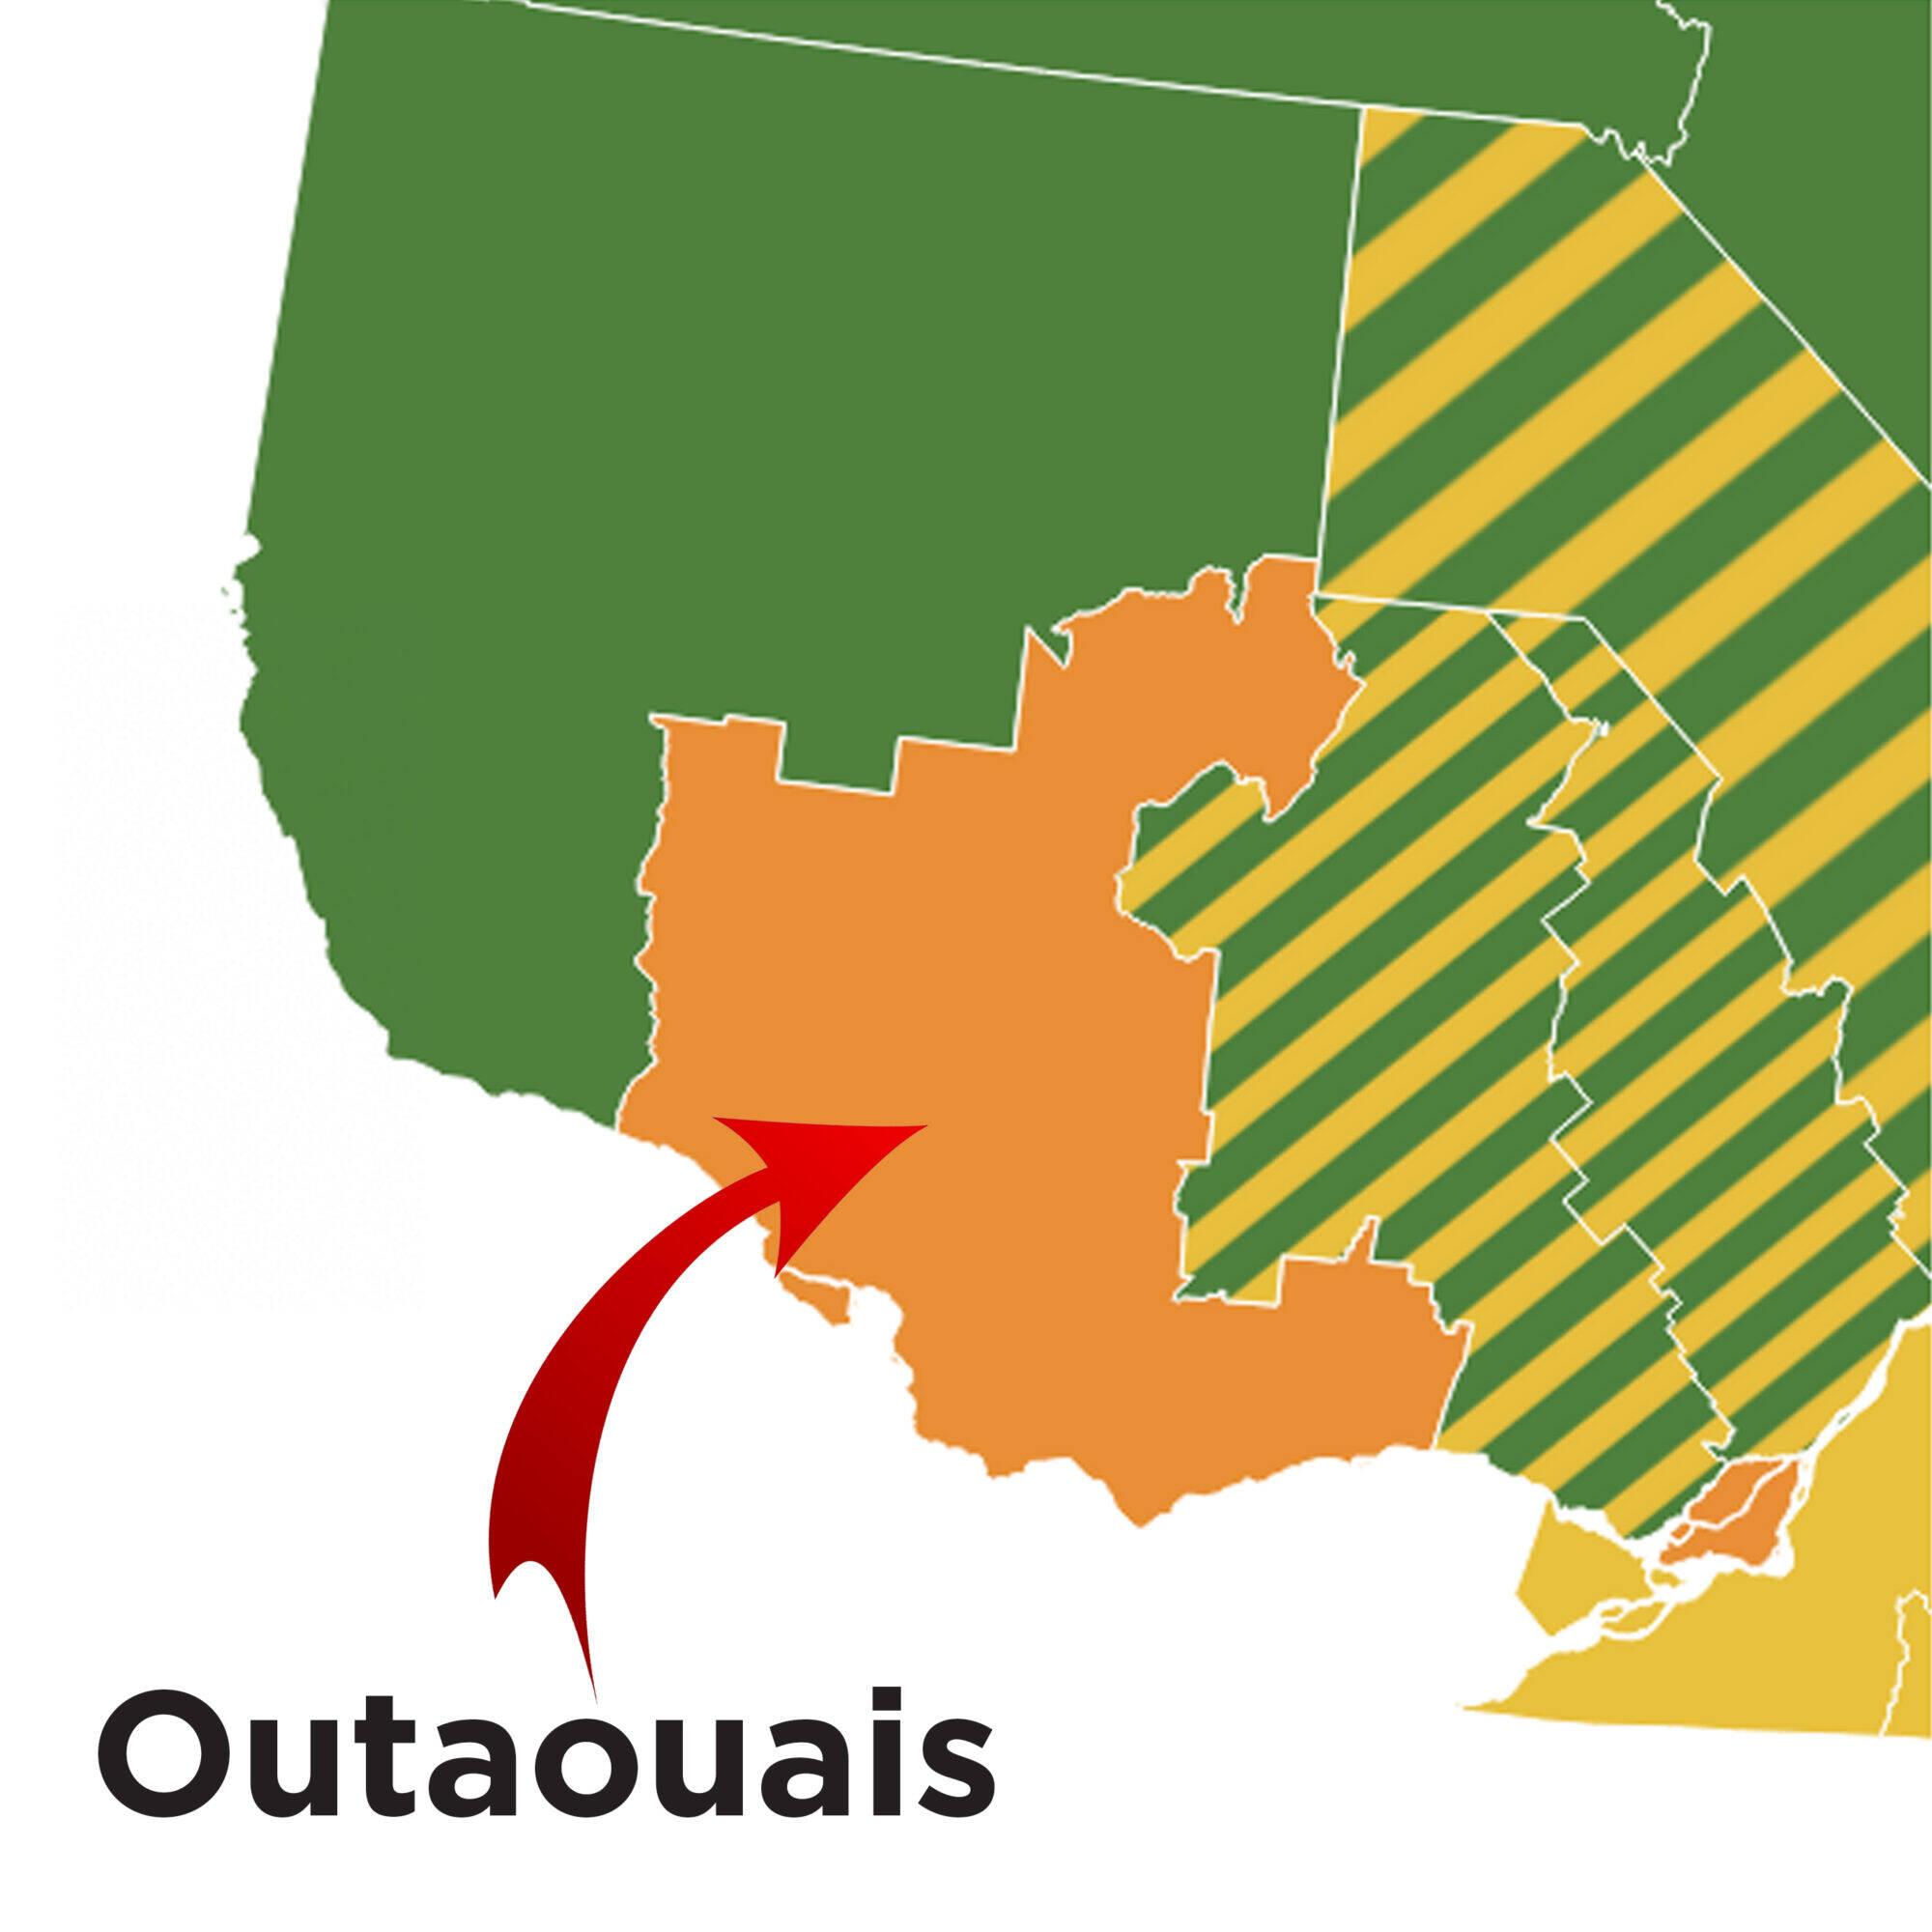 Outaouais orange